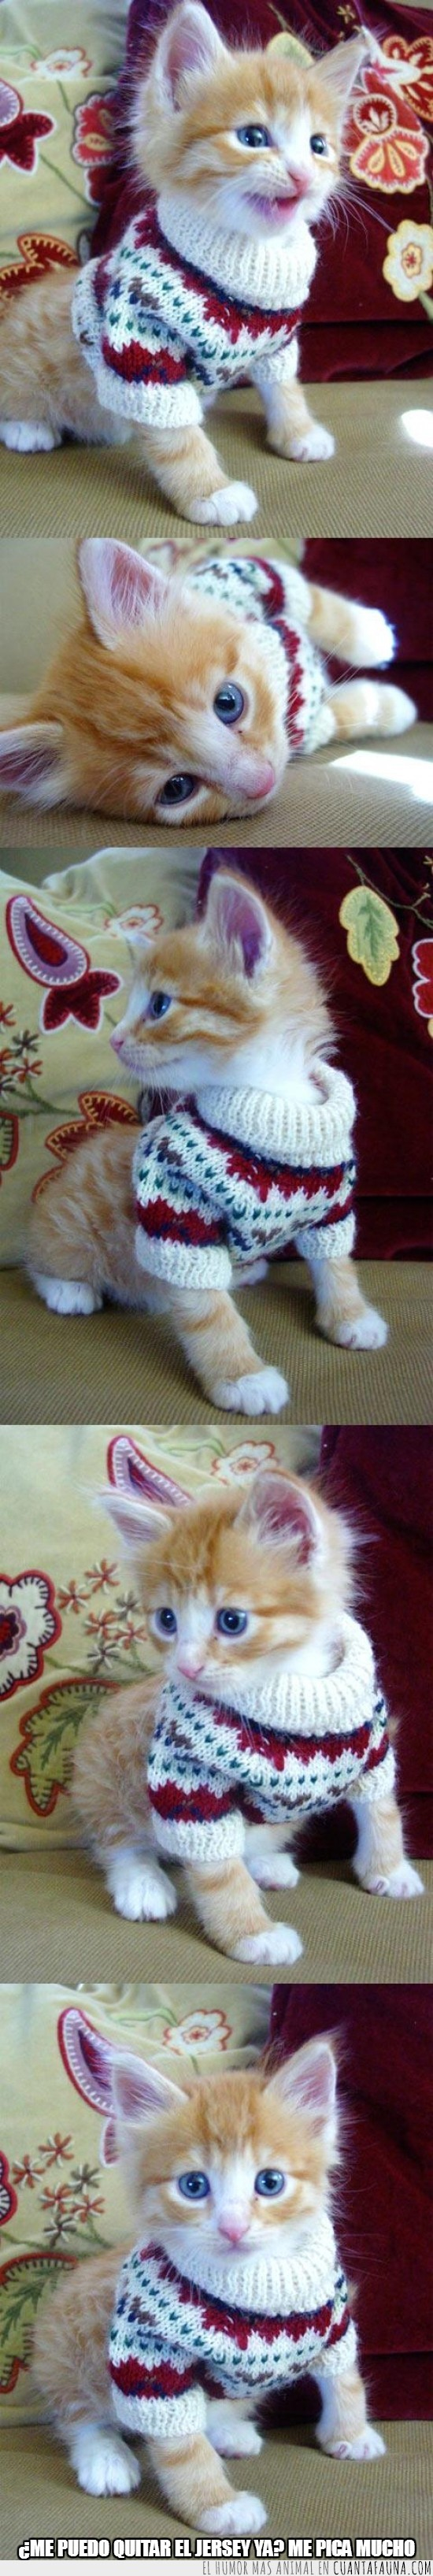 gato,jersey de lana,regalado